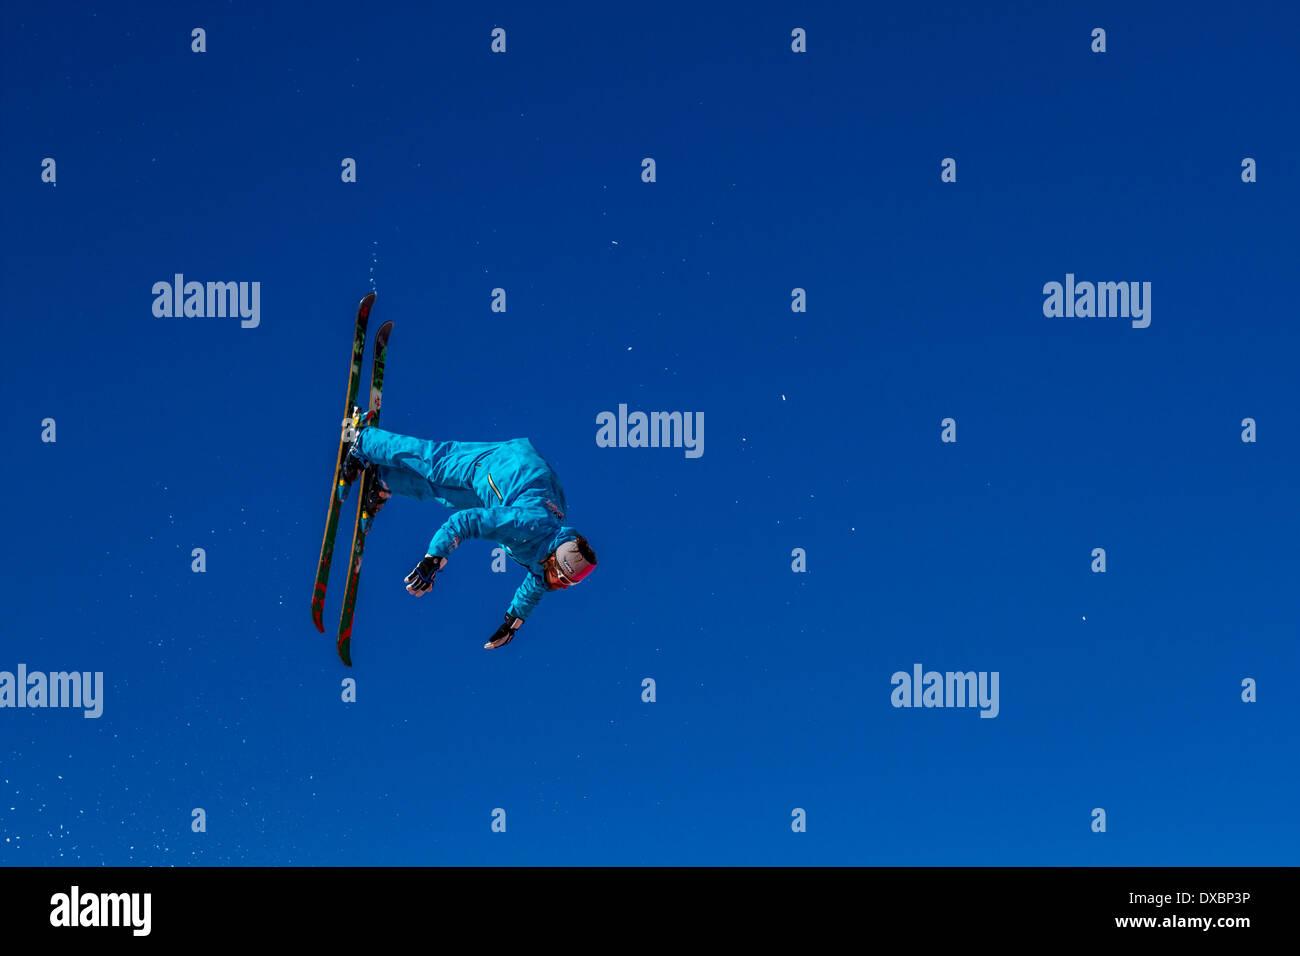 Ski instructor practising and demonstrating ski jumping, landing on a giant airbag - Stock Image